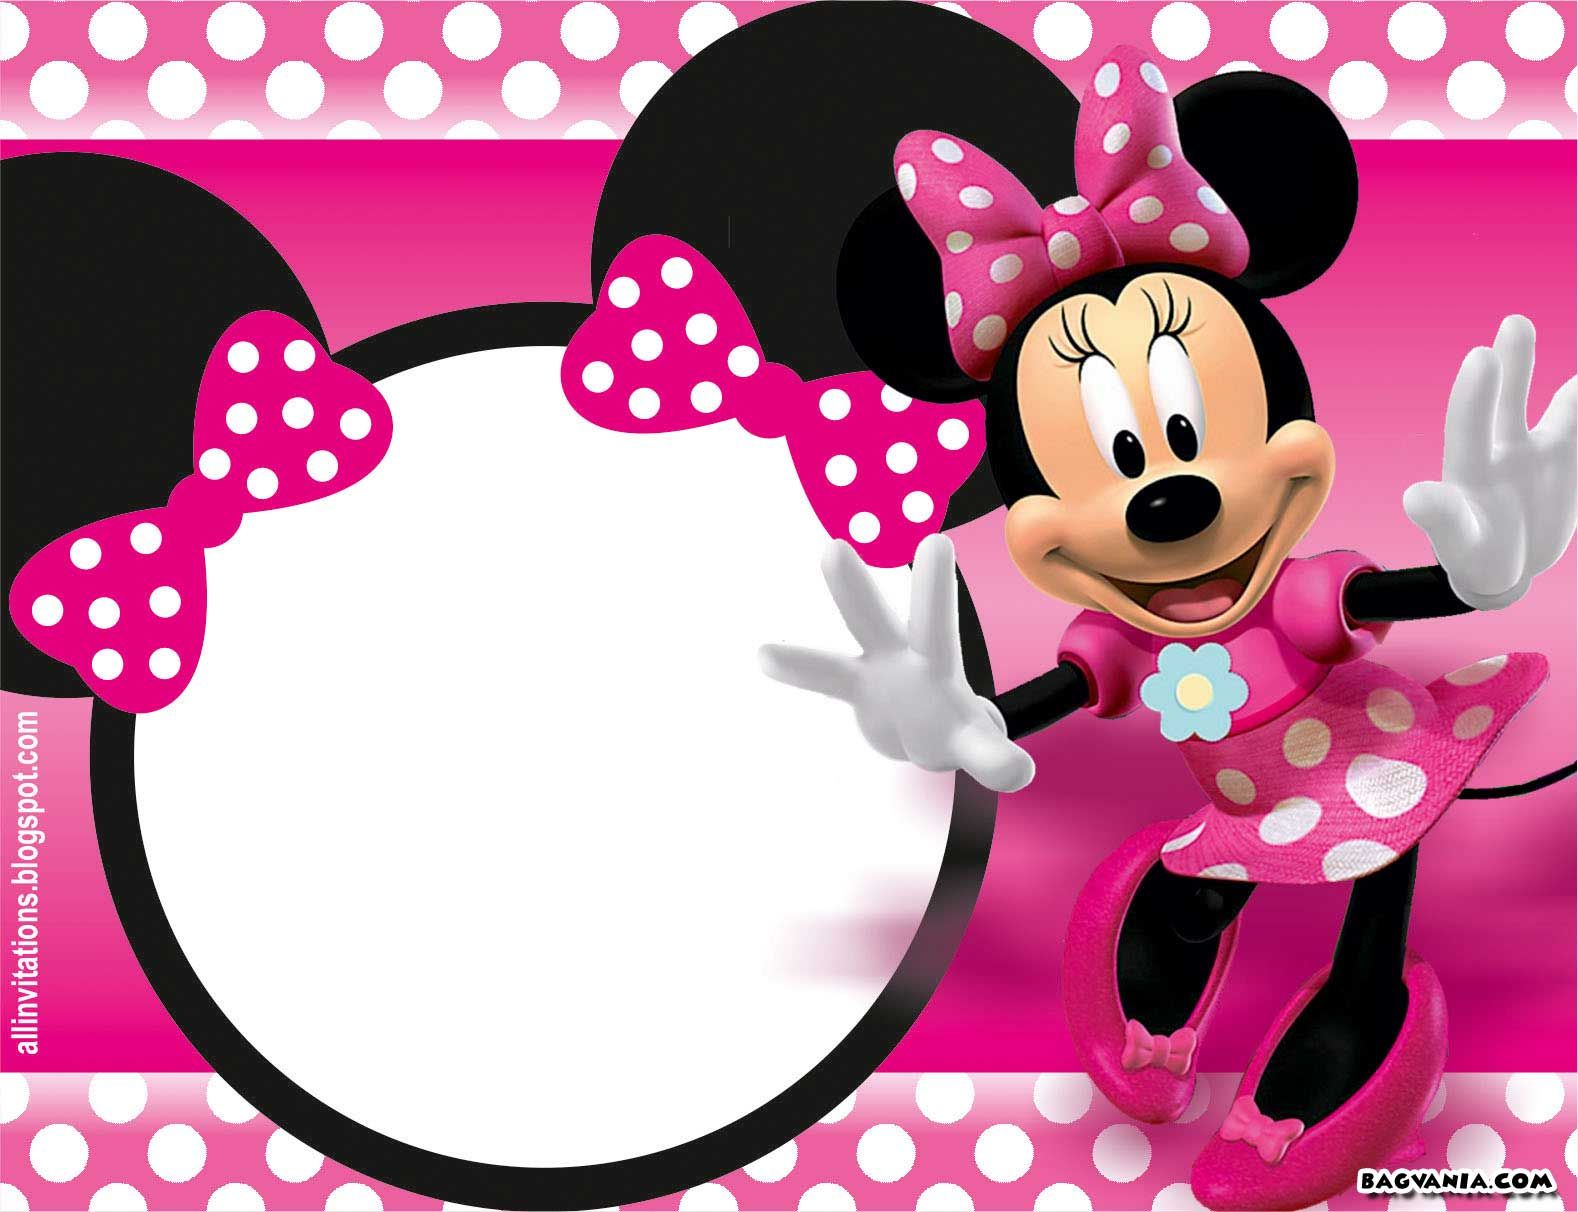 Free Printable Minnie Mouse Birthday Invitations – Bagvania Free - Free Printable Mickey Mouse Invitations